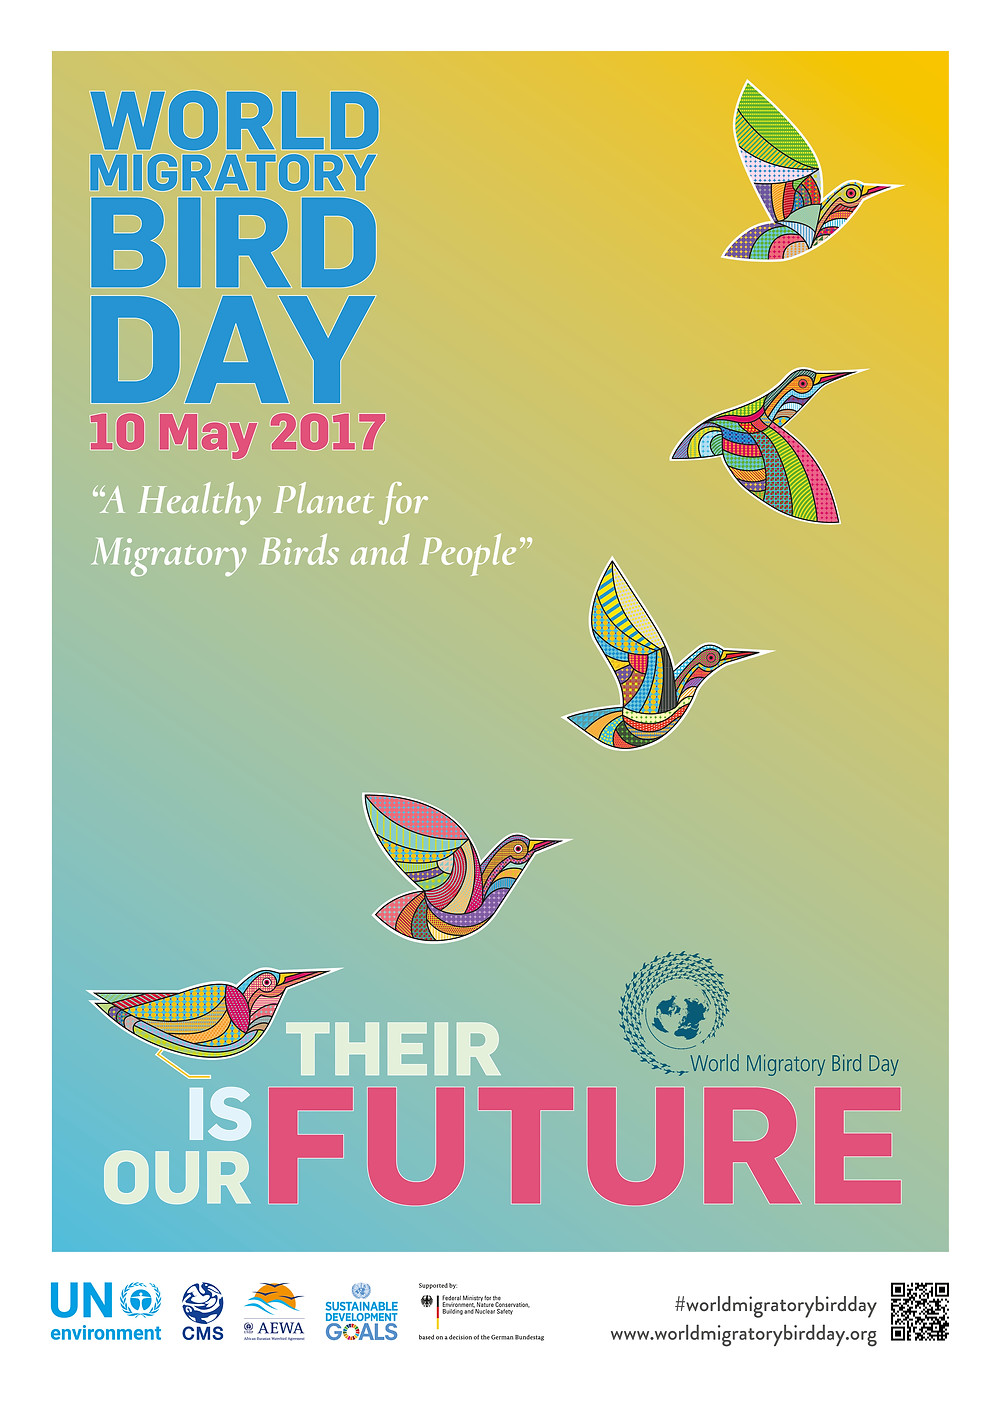 Migratory bird day 2017